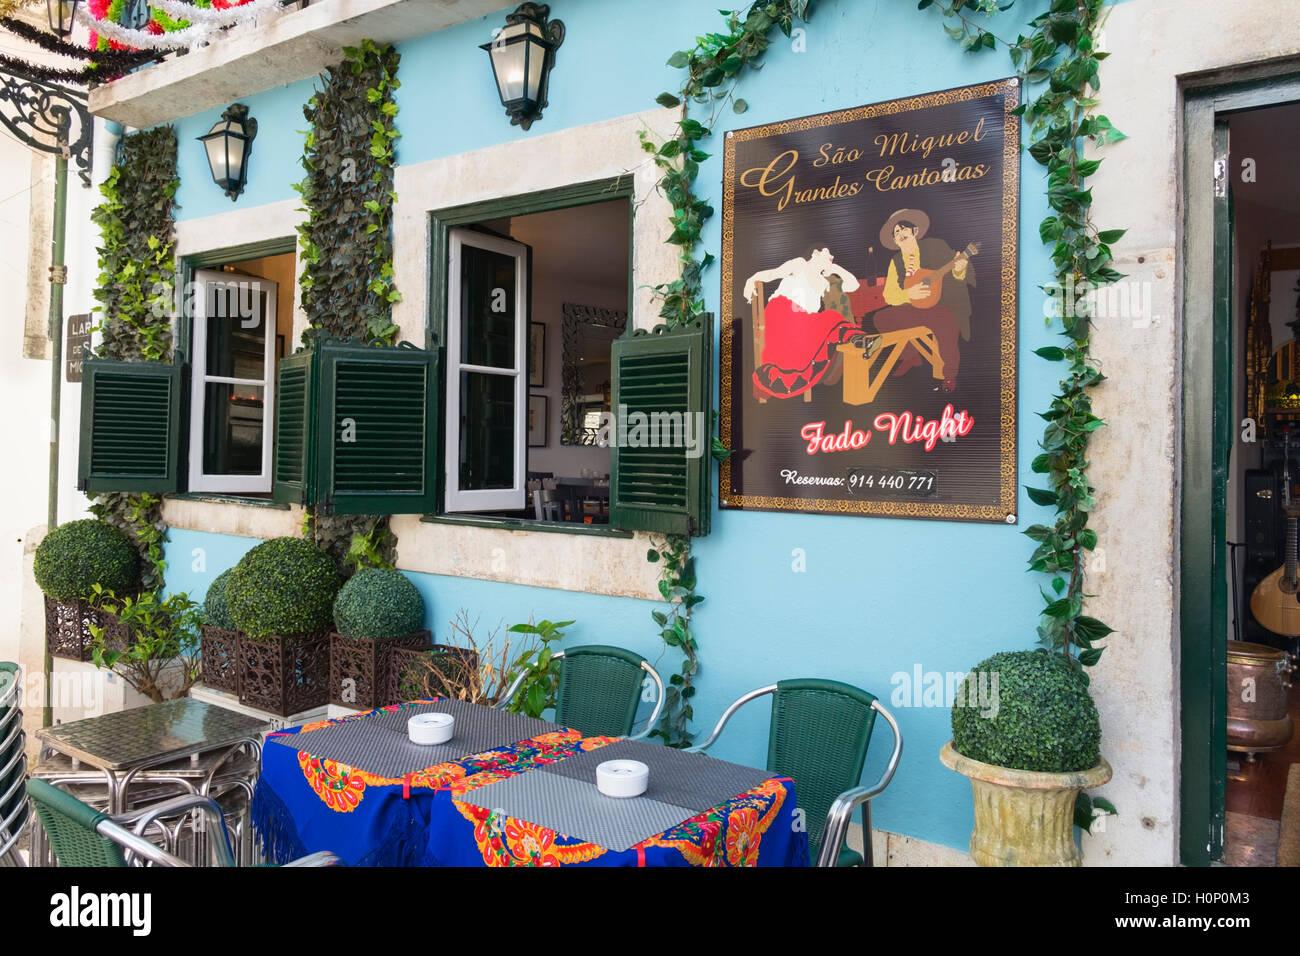 Fado restaurant Alfama Lisbon Portugal - Stock Image